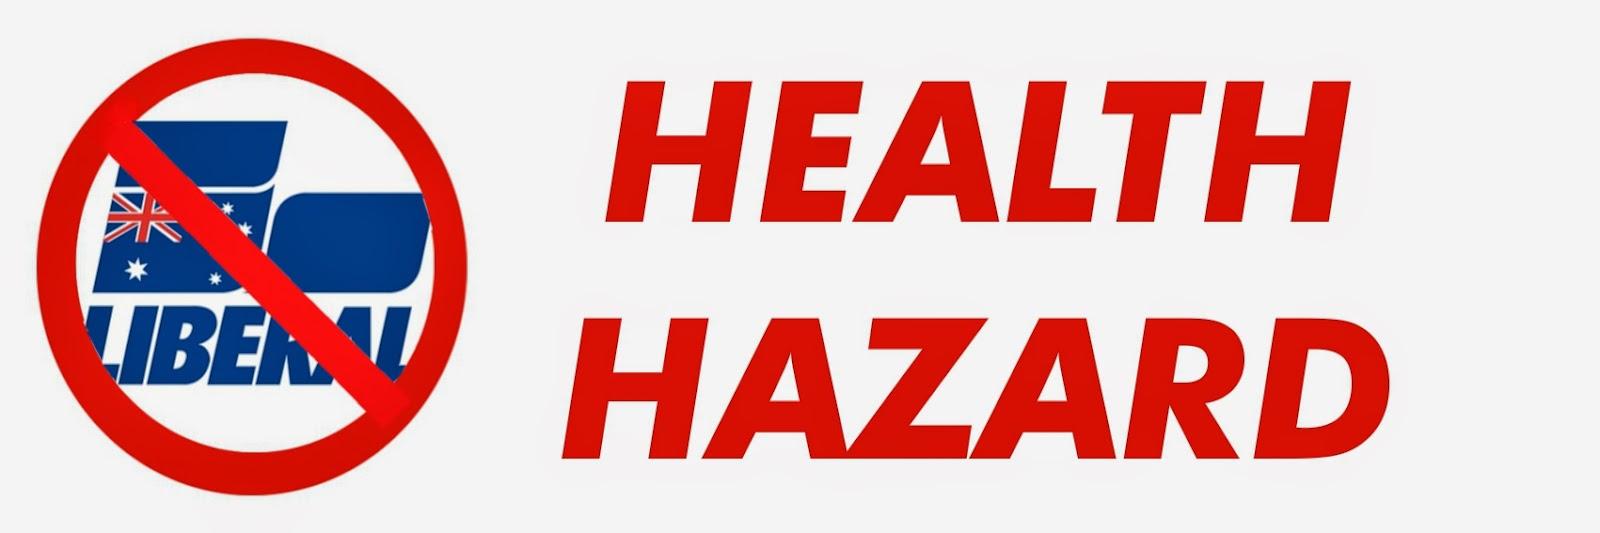 Liberal Health Hazard